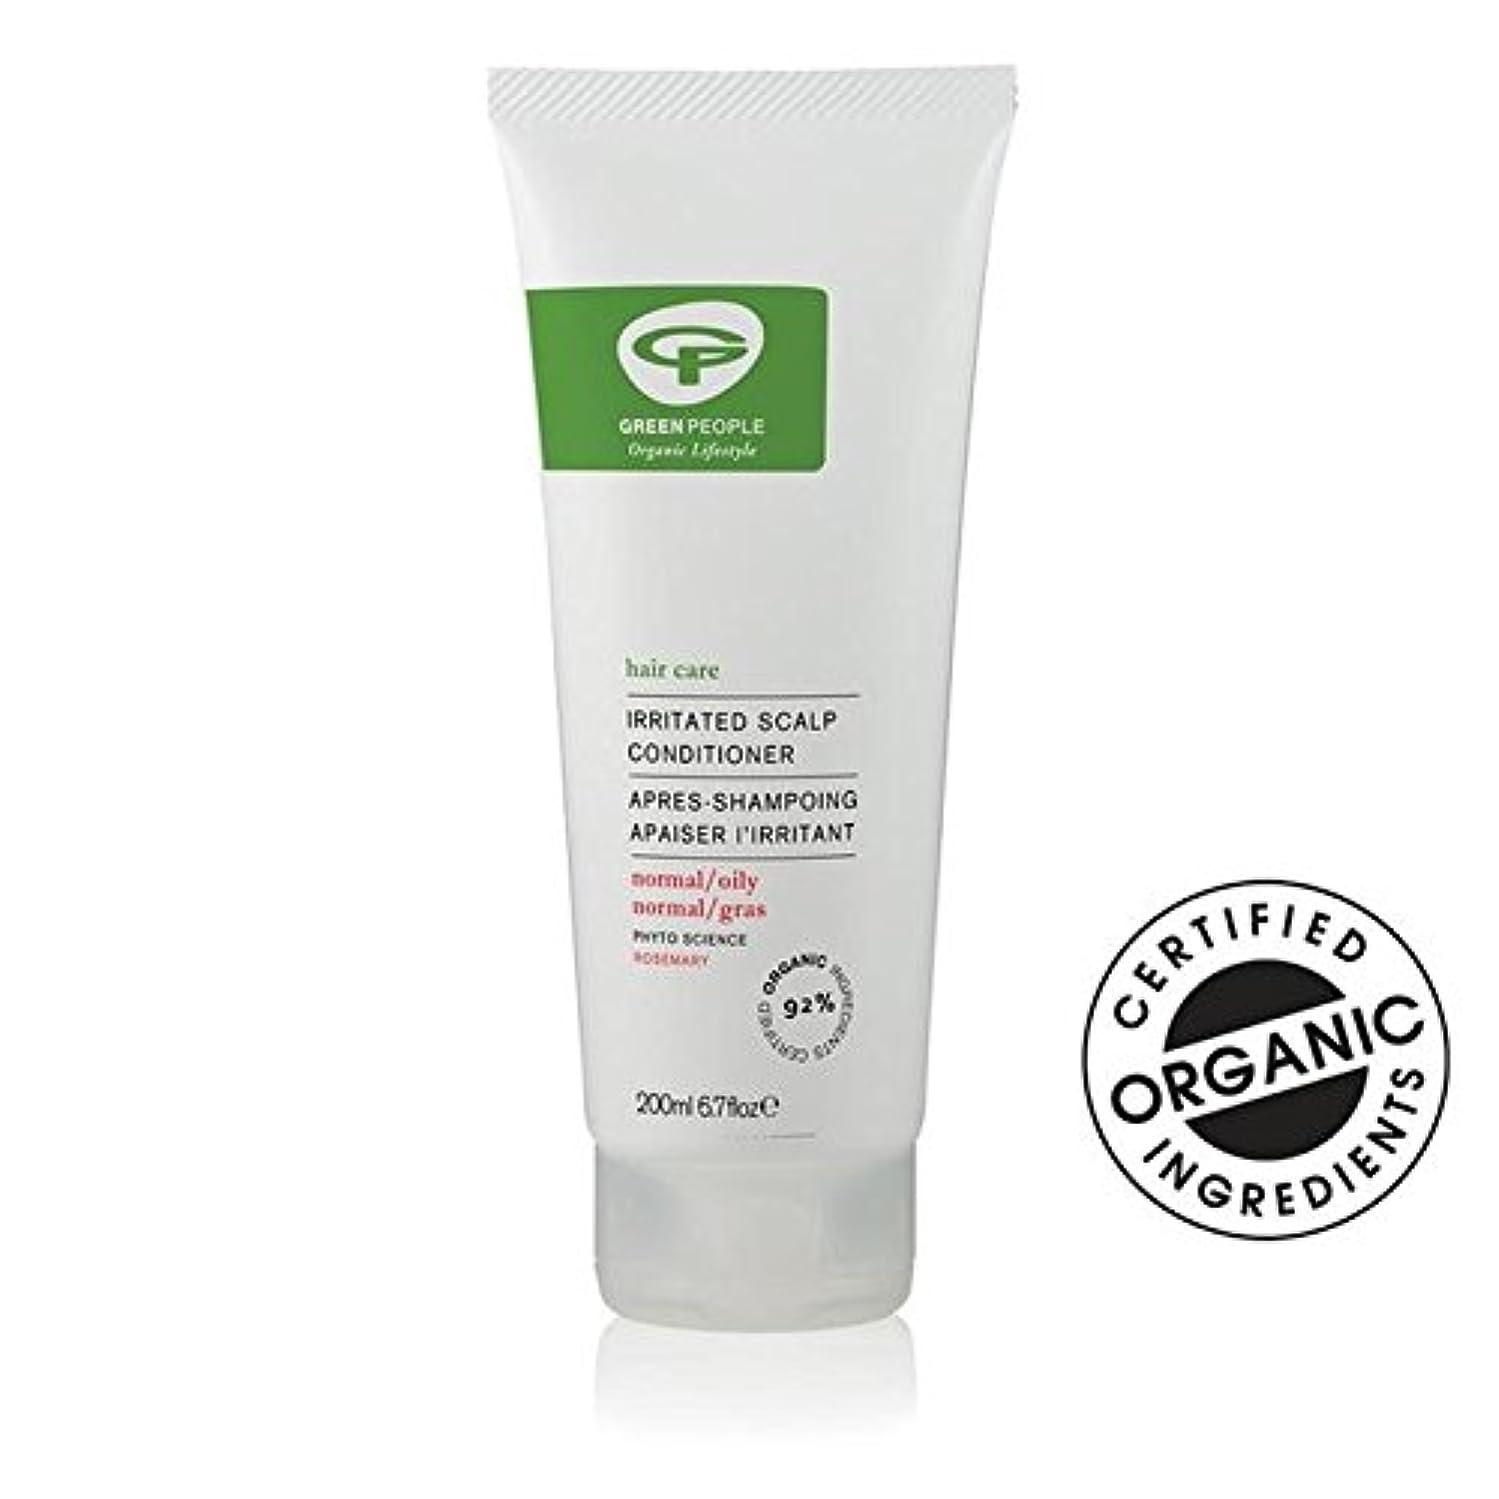 Green People Irritated Scalp Conditioner 200ml (Pack of 6) - 緑の人々イライラ頭皮コンディショナー200 x6 [並行輸入品]